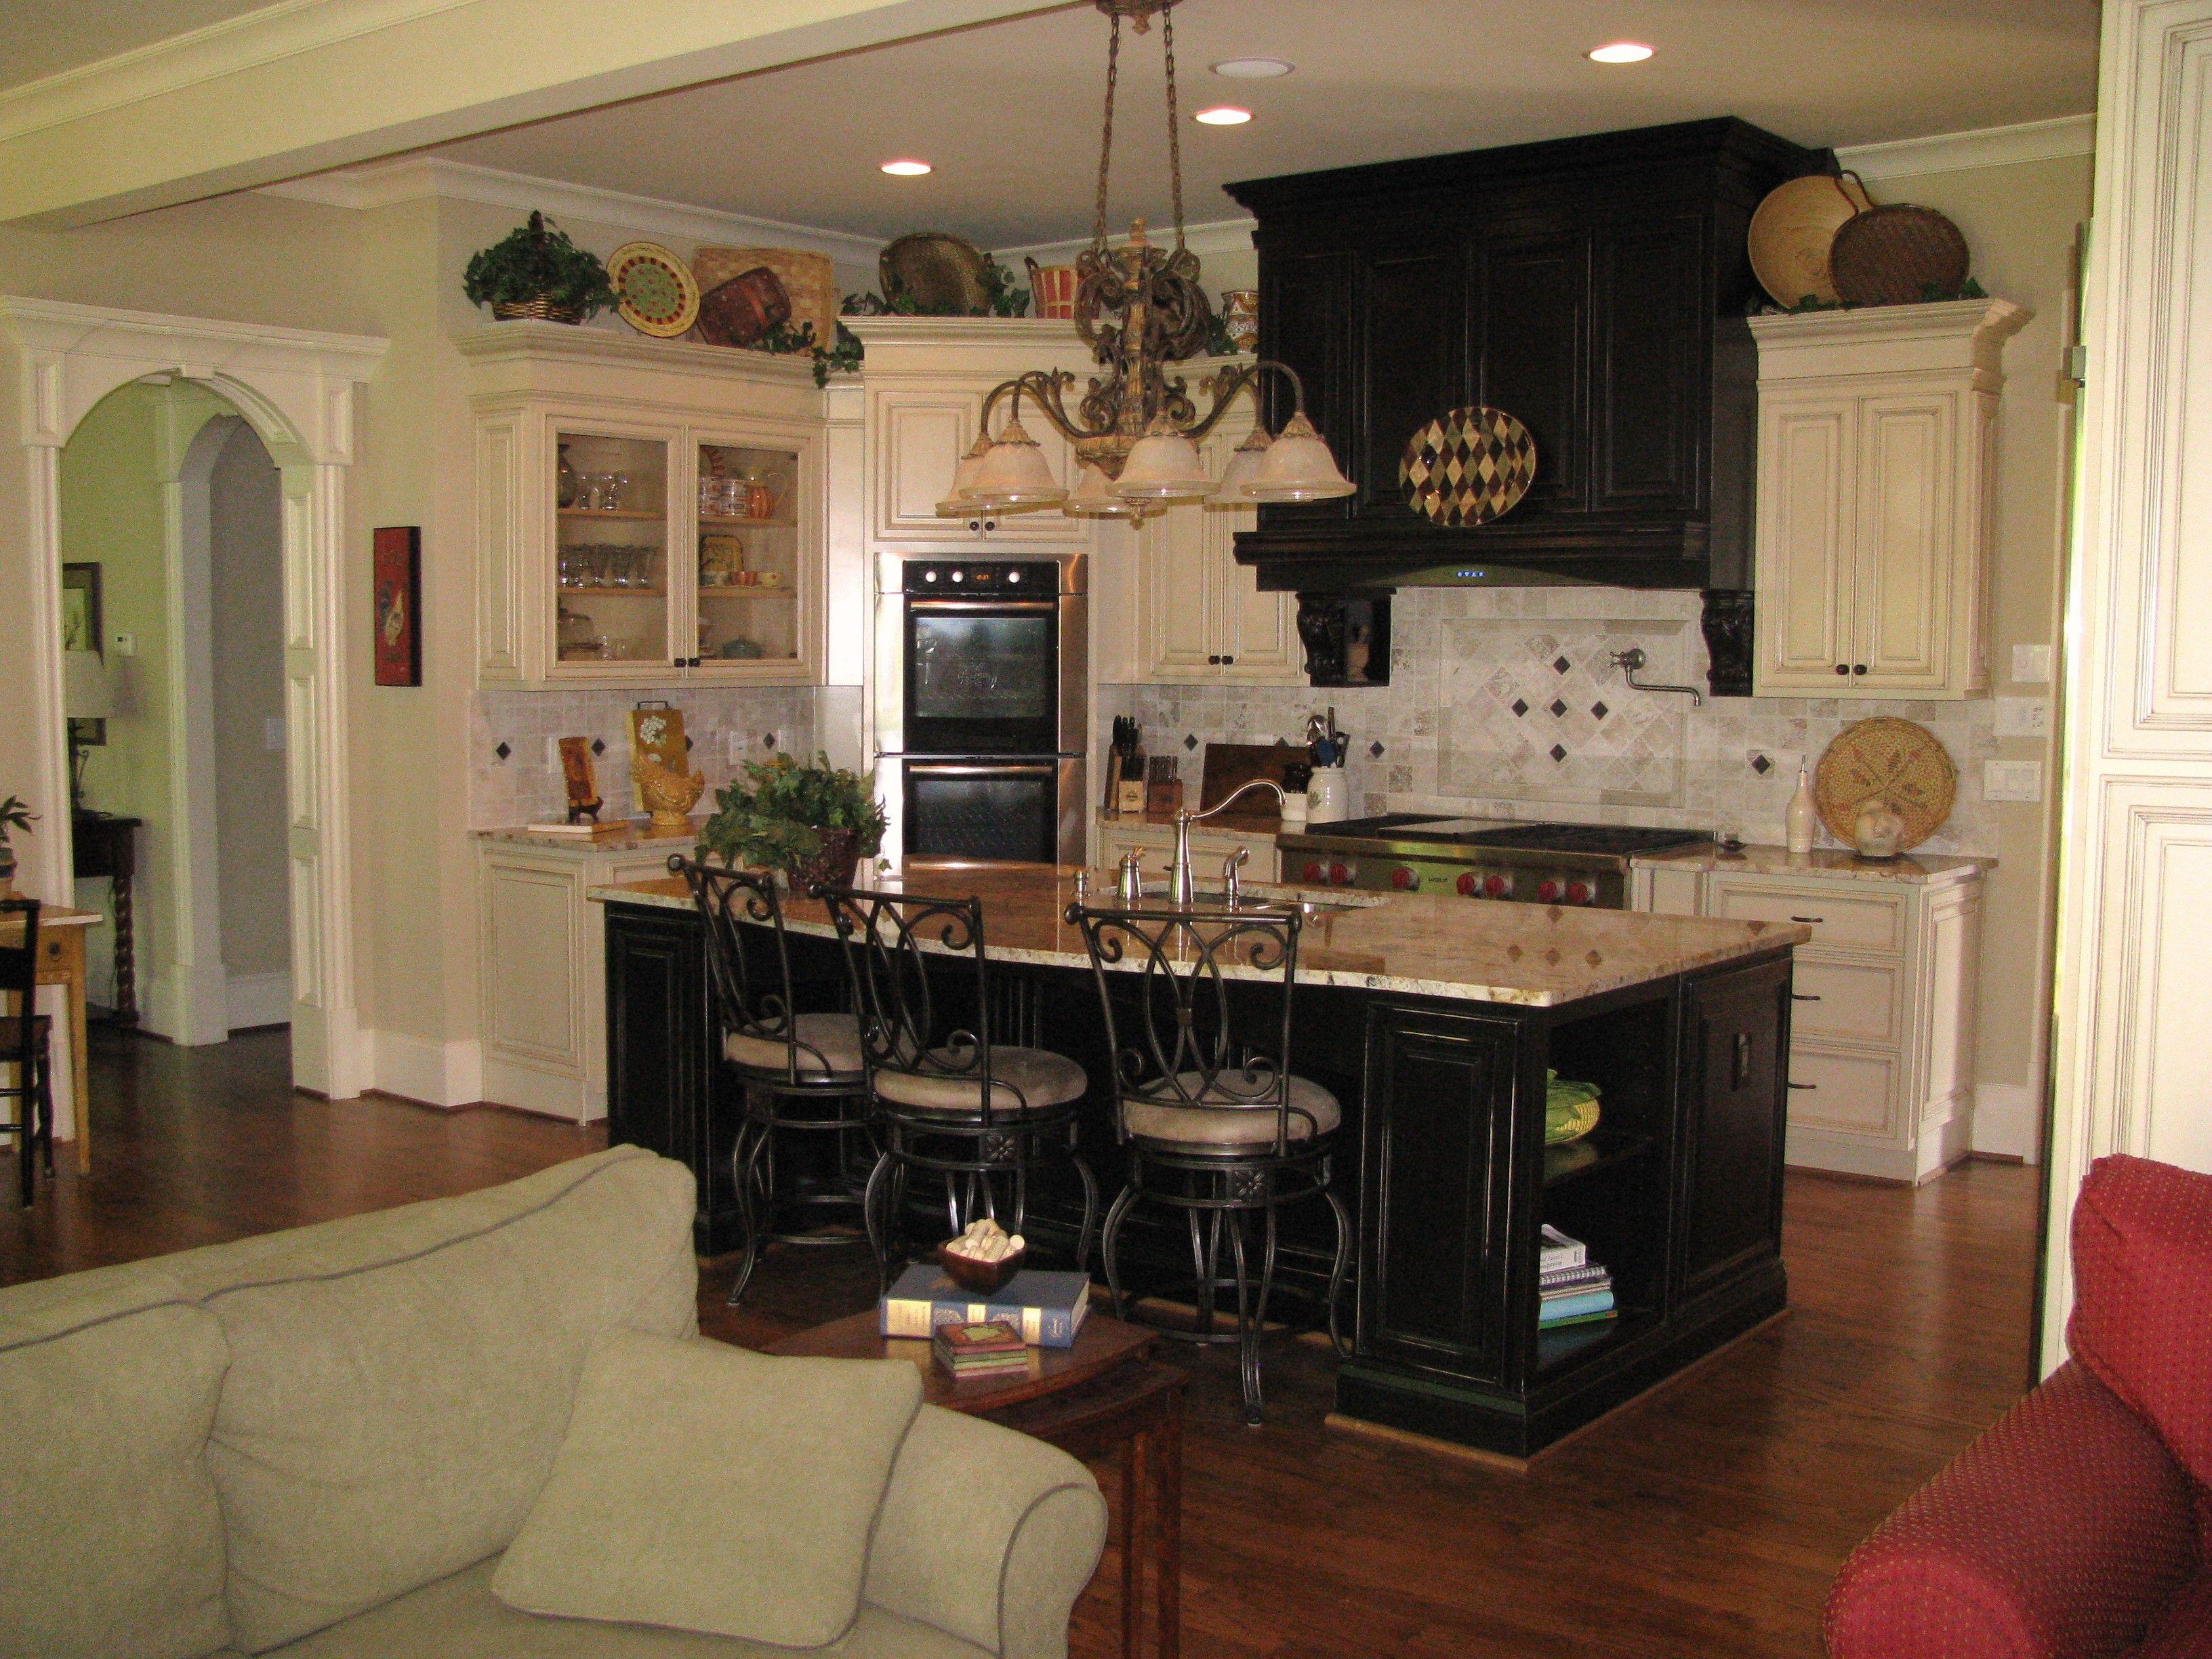 kitchen cabinets, wood floors, white trim. Nice open floor ...